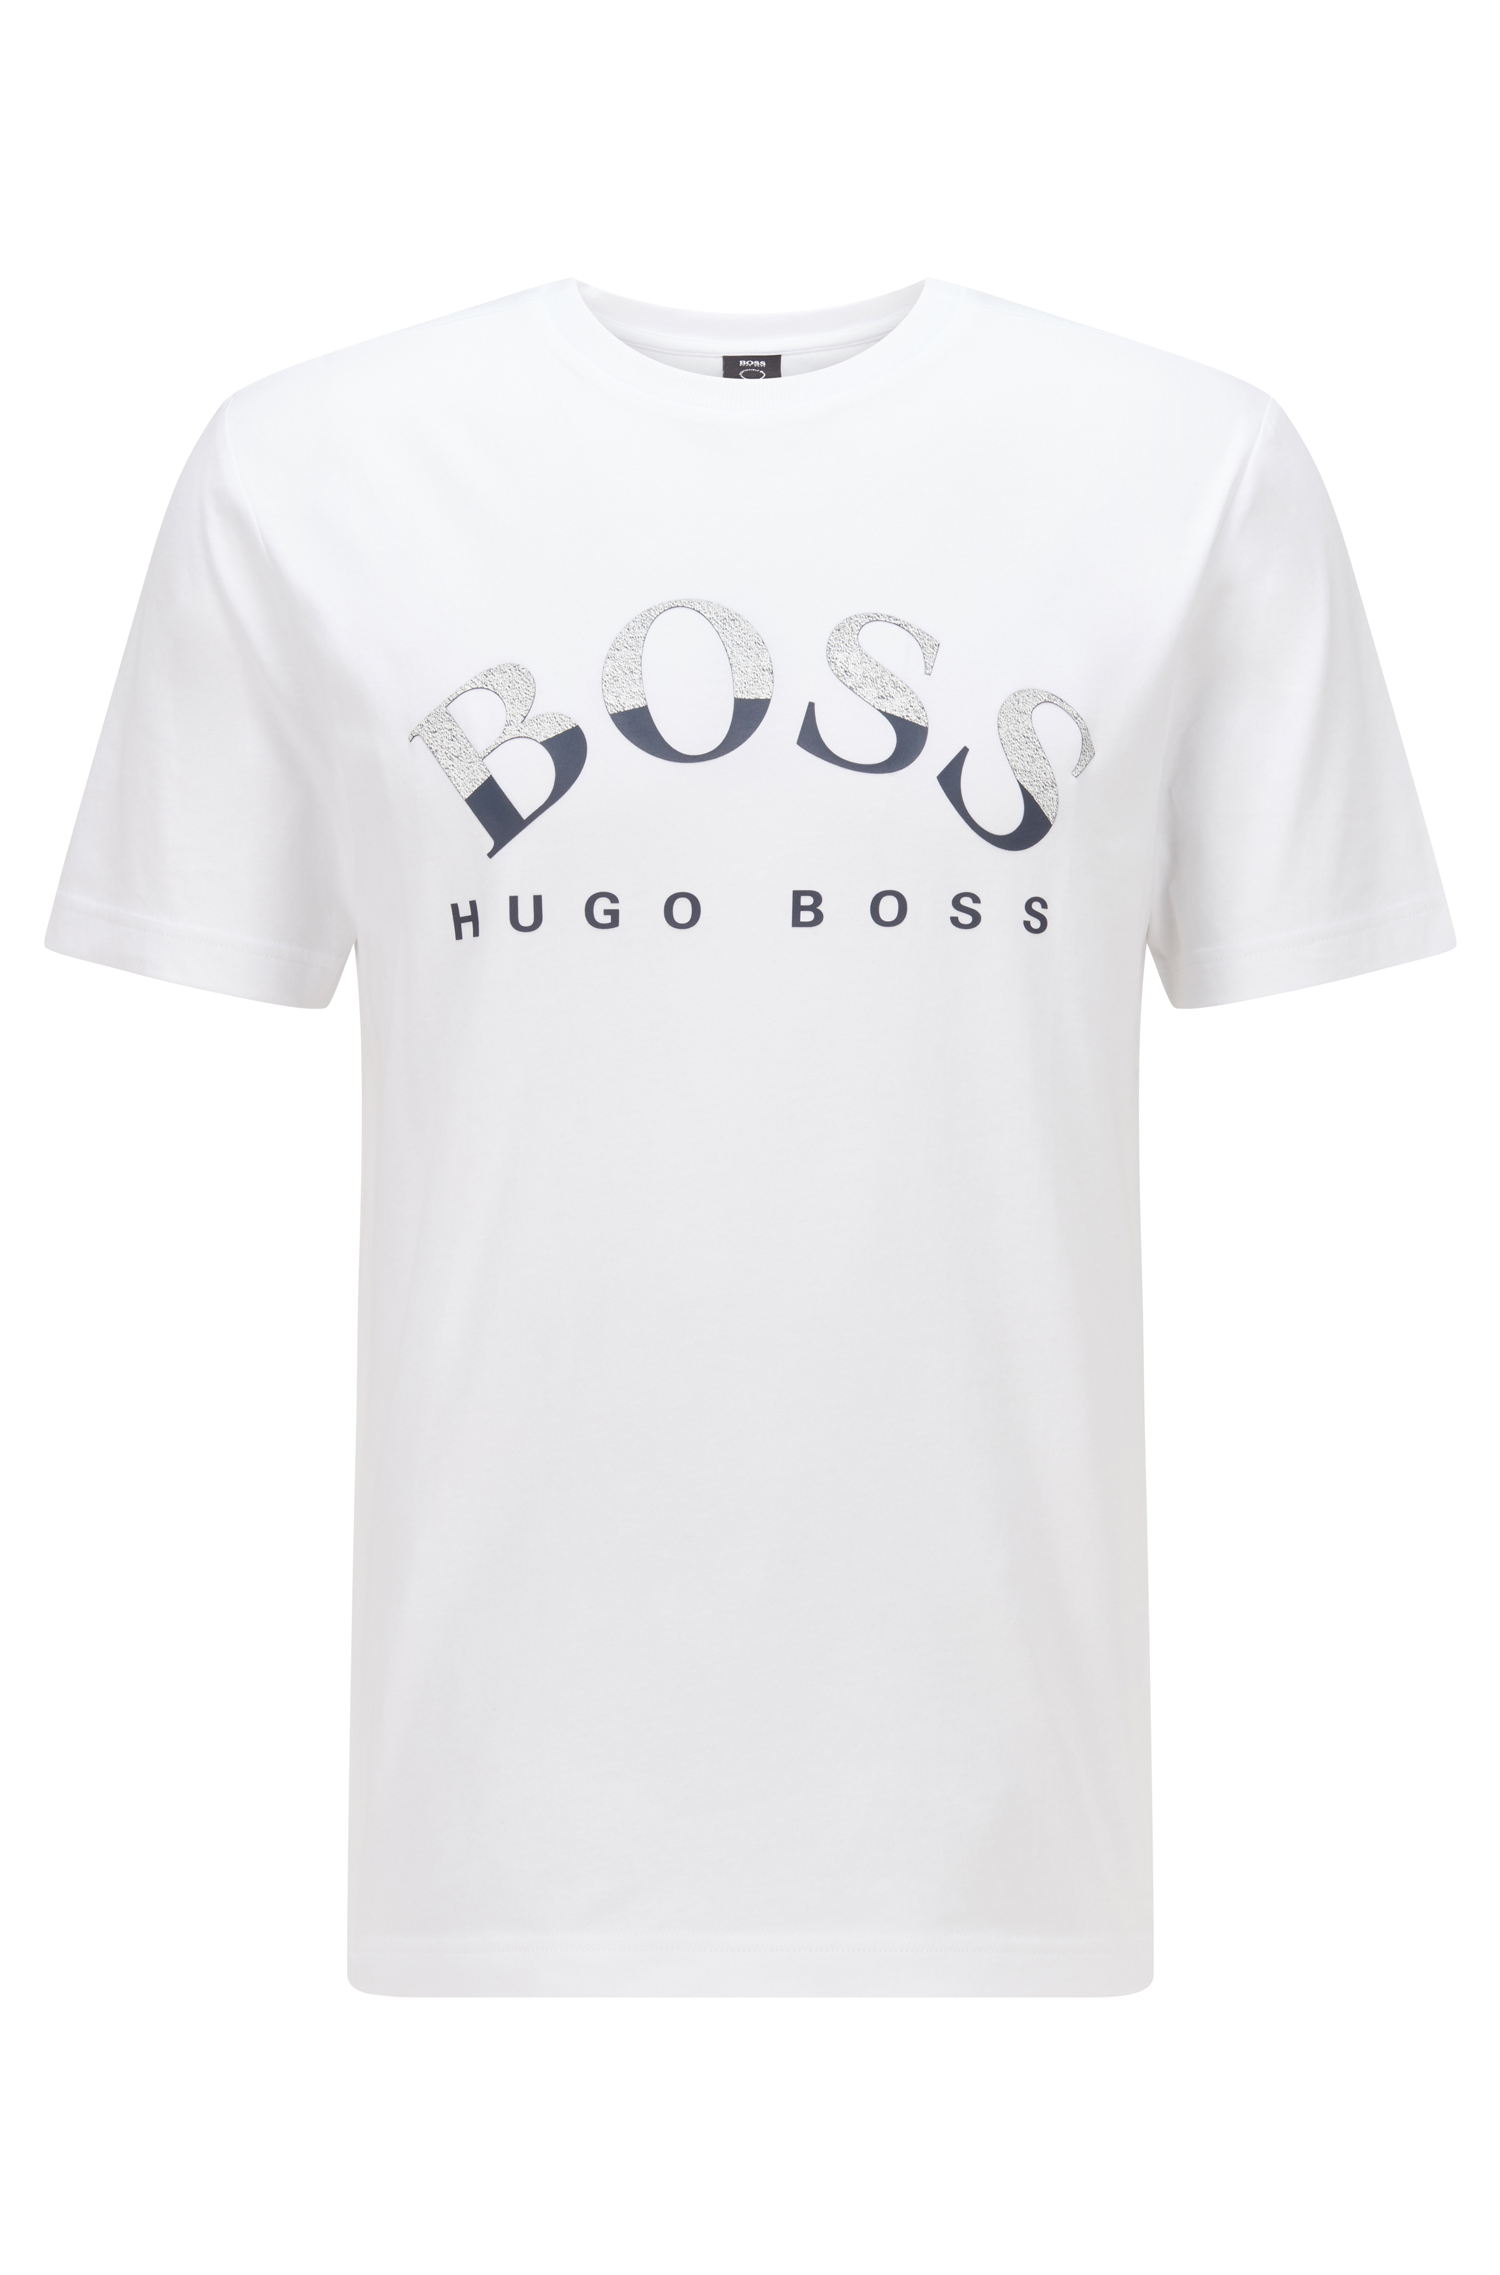 Hugo Boss Jersey t-shirt, white, xxx-large